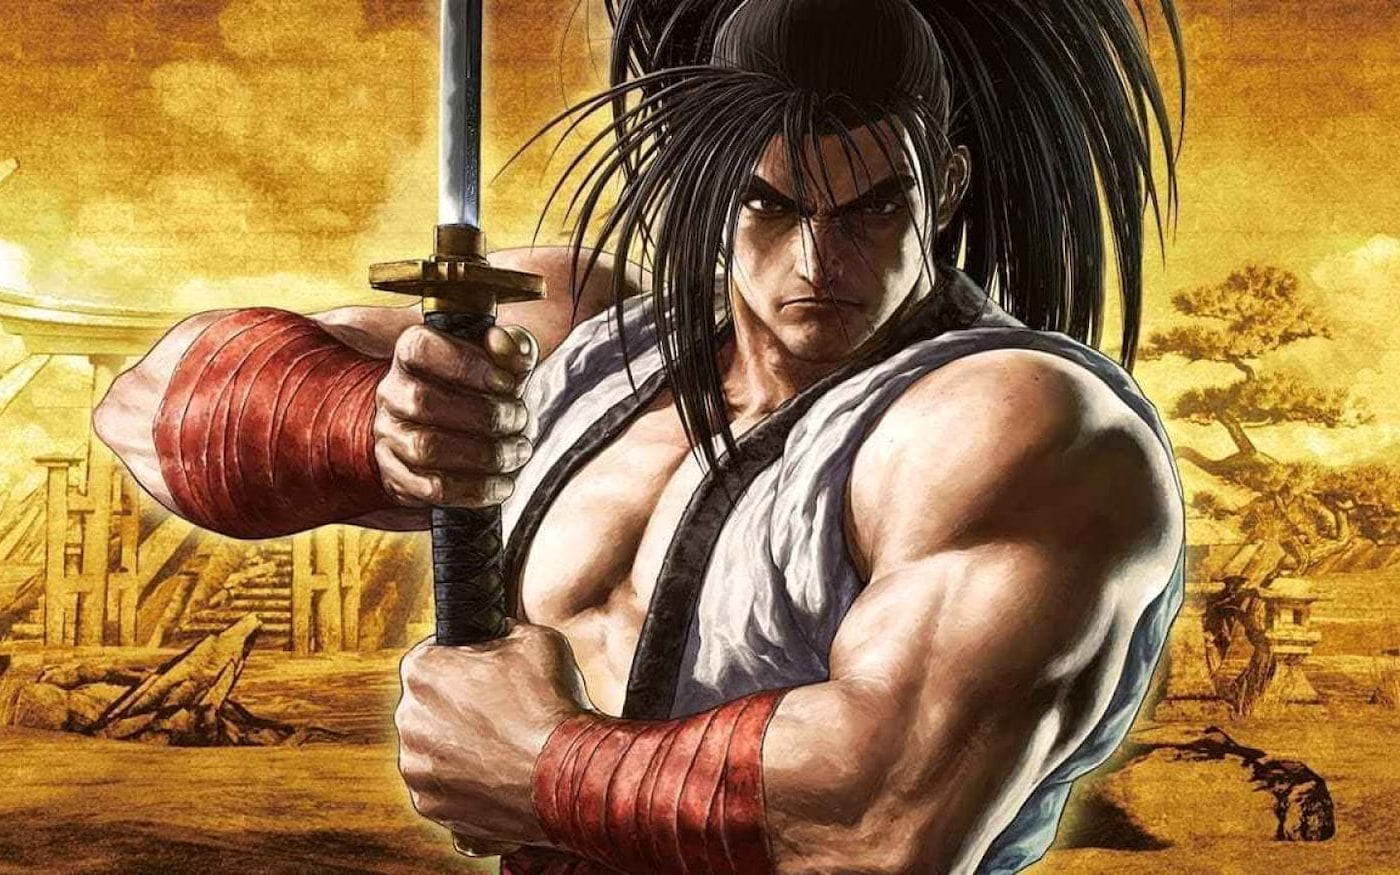 [Samurai Shodown] Jogo ganha segundo trailer do Nintendo Switch